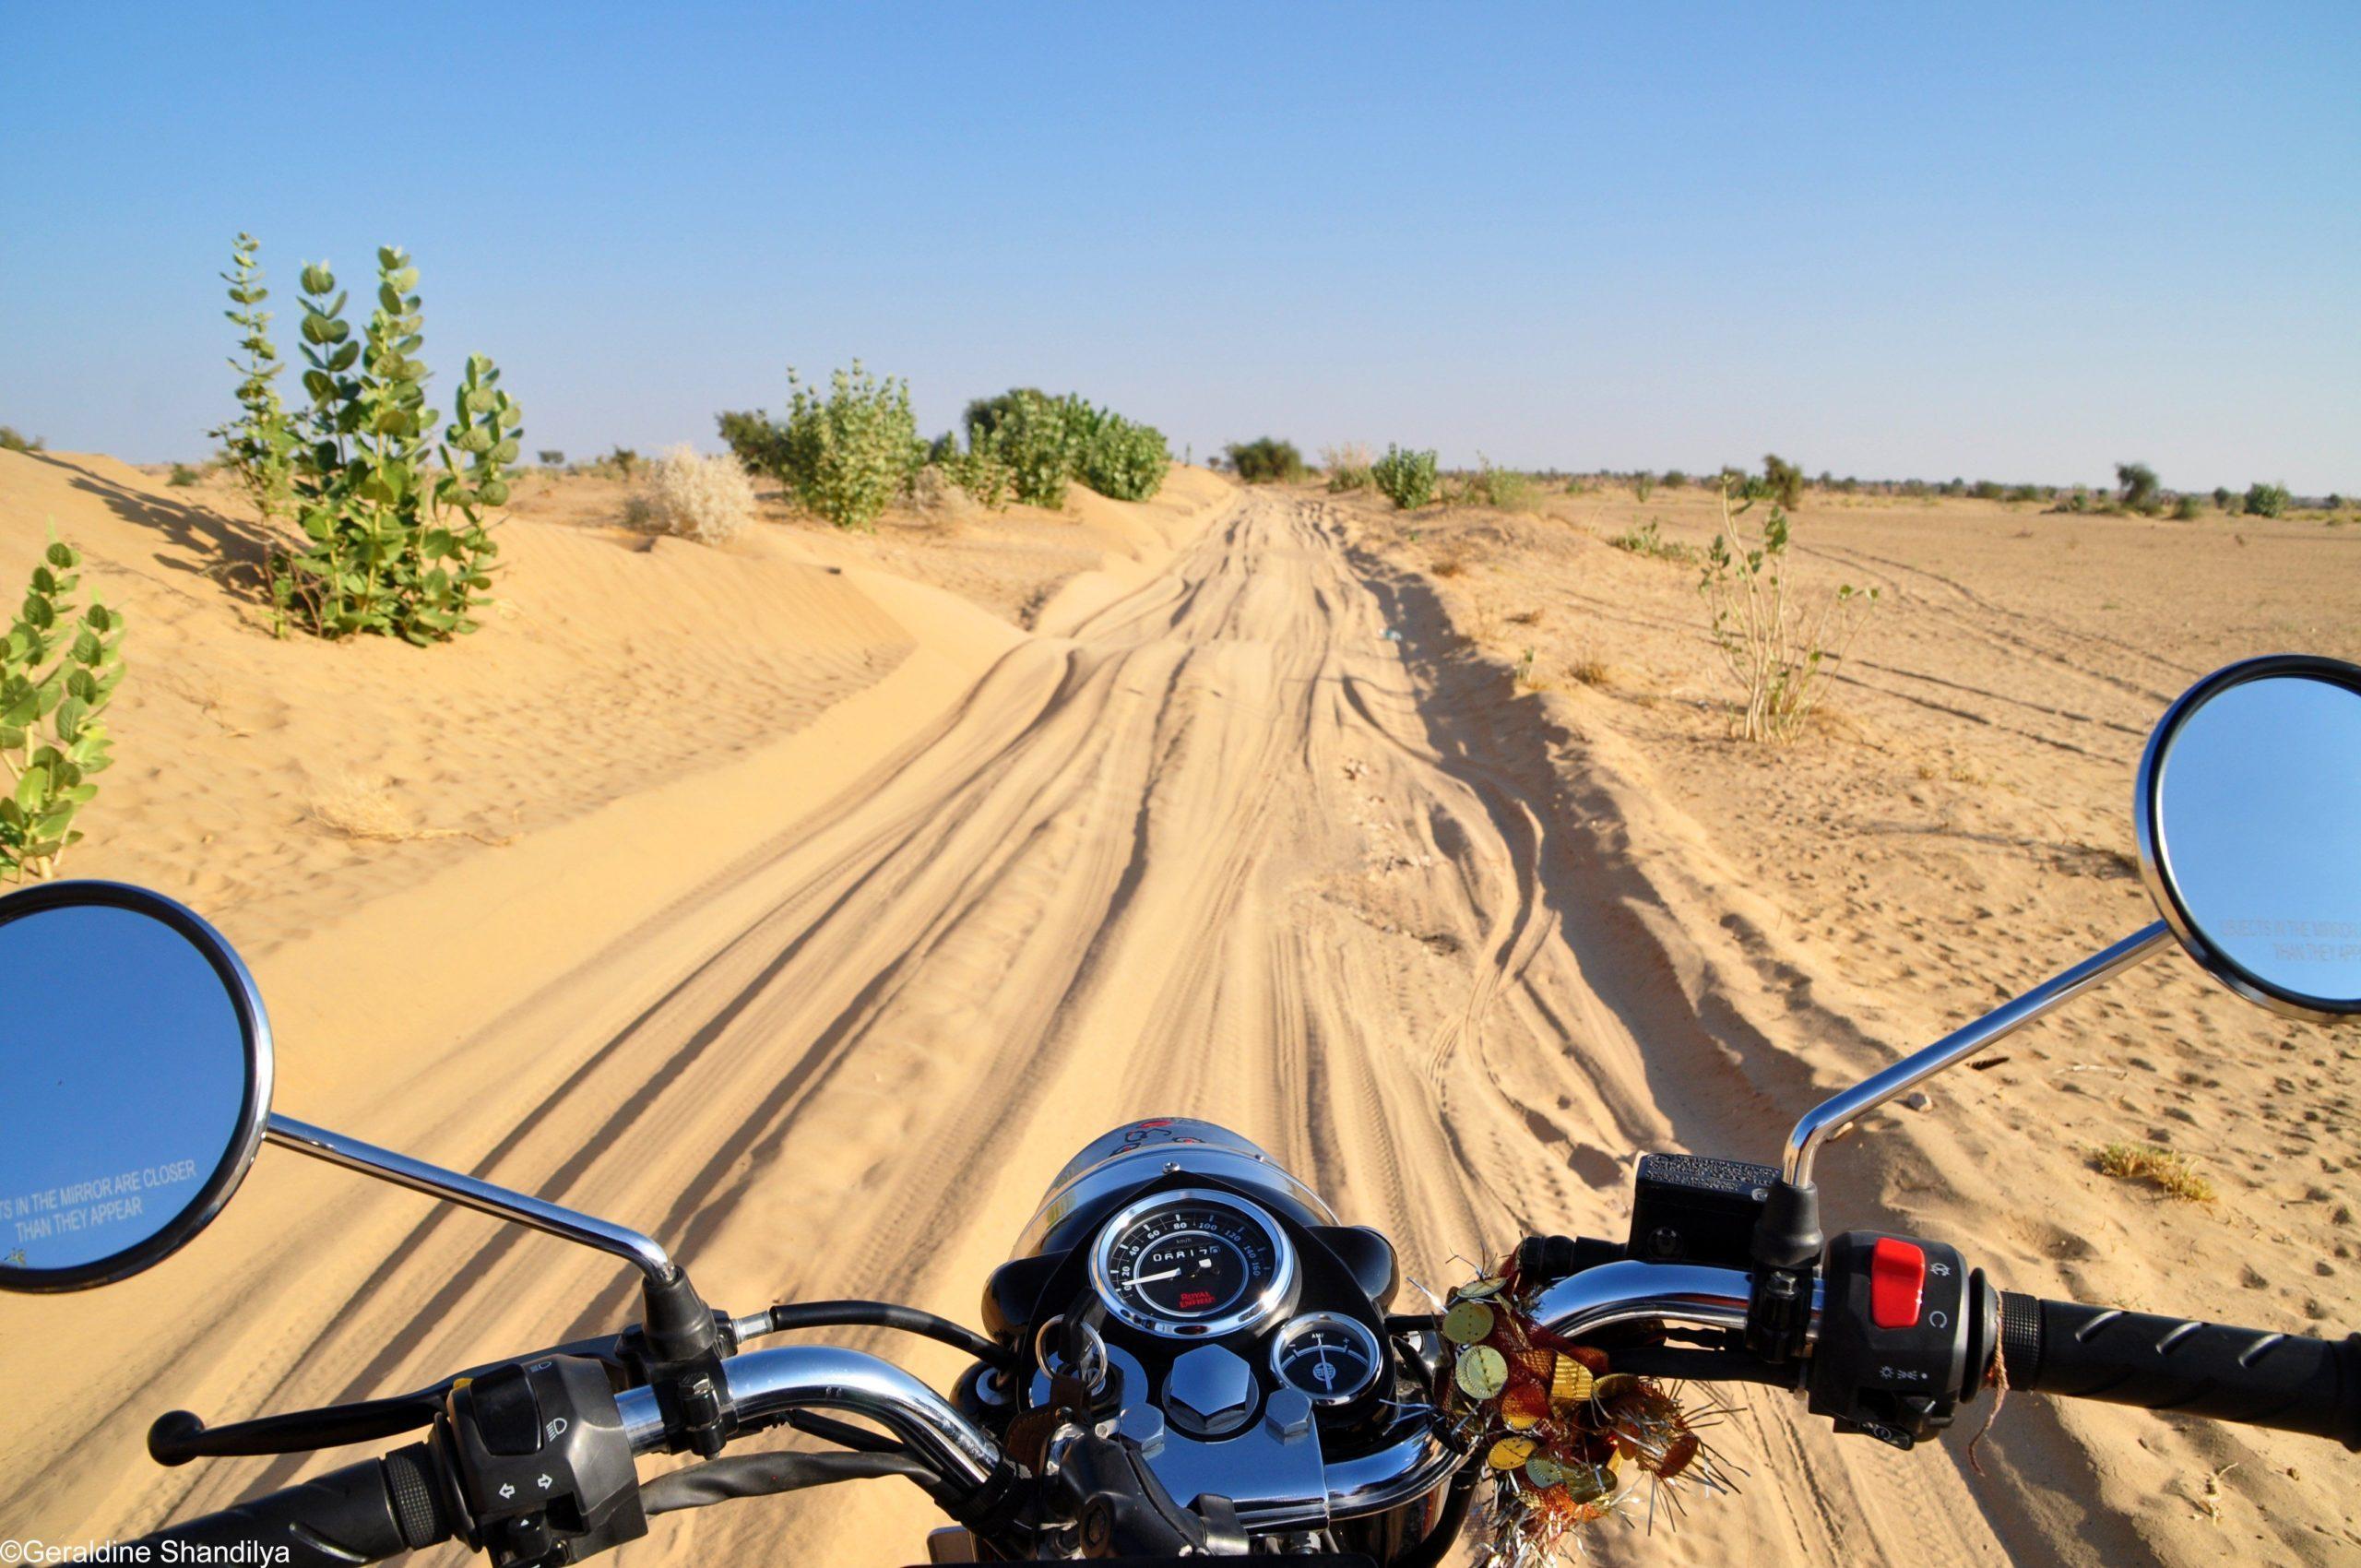 Motorcycle road trip India / North India - Rajasthan Adventure